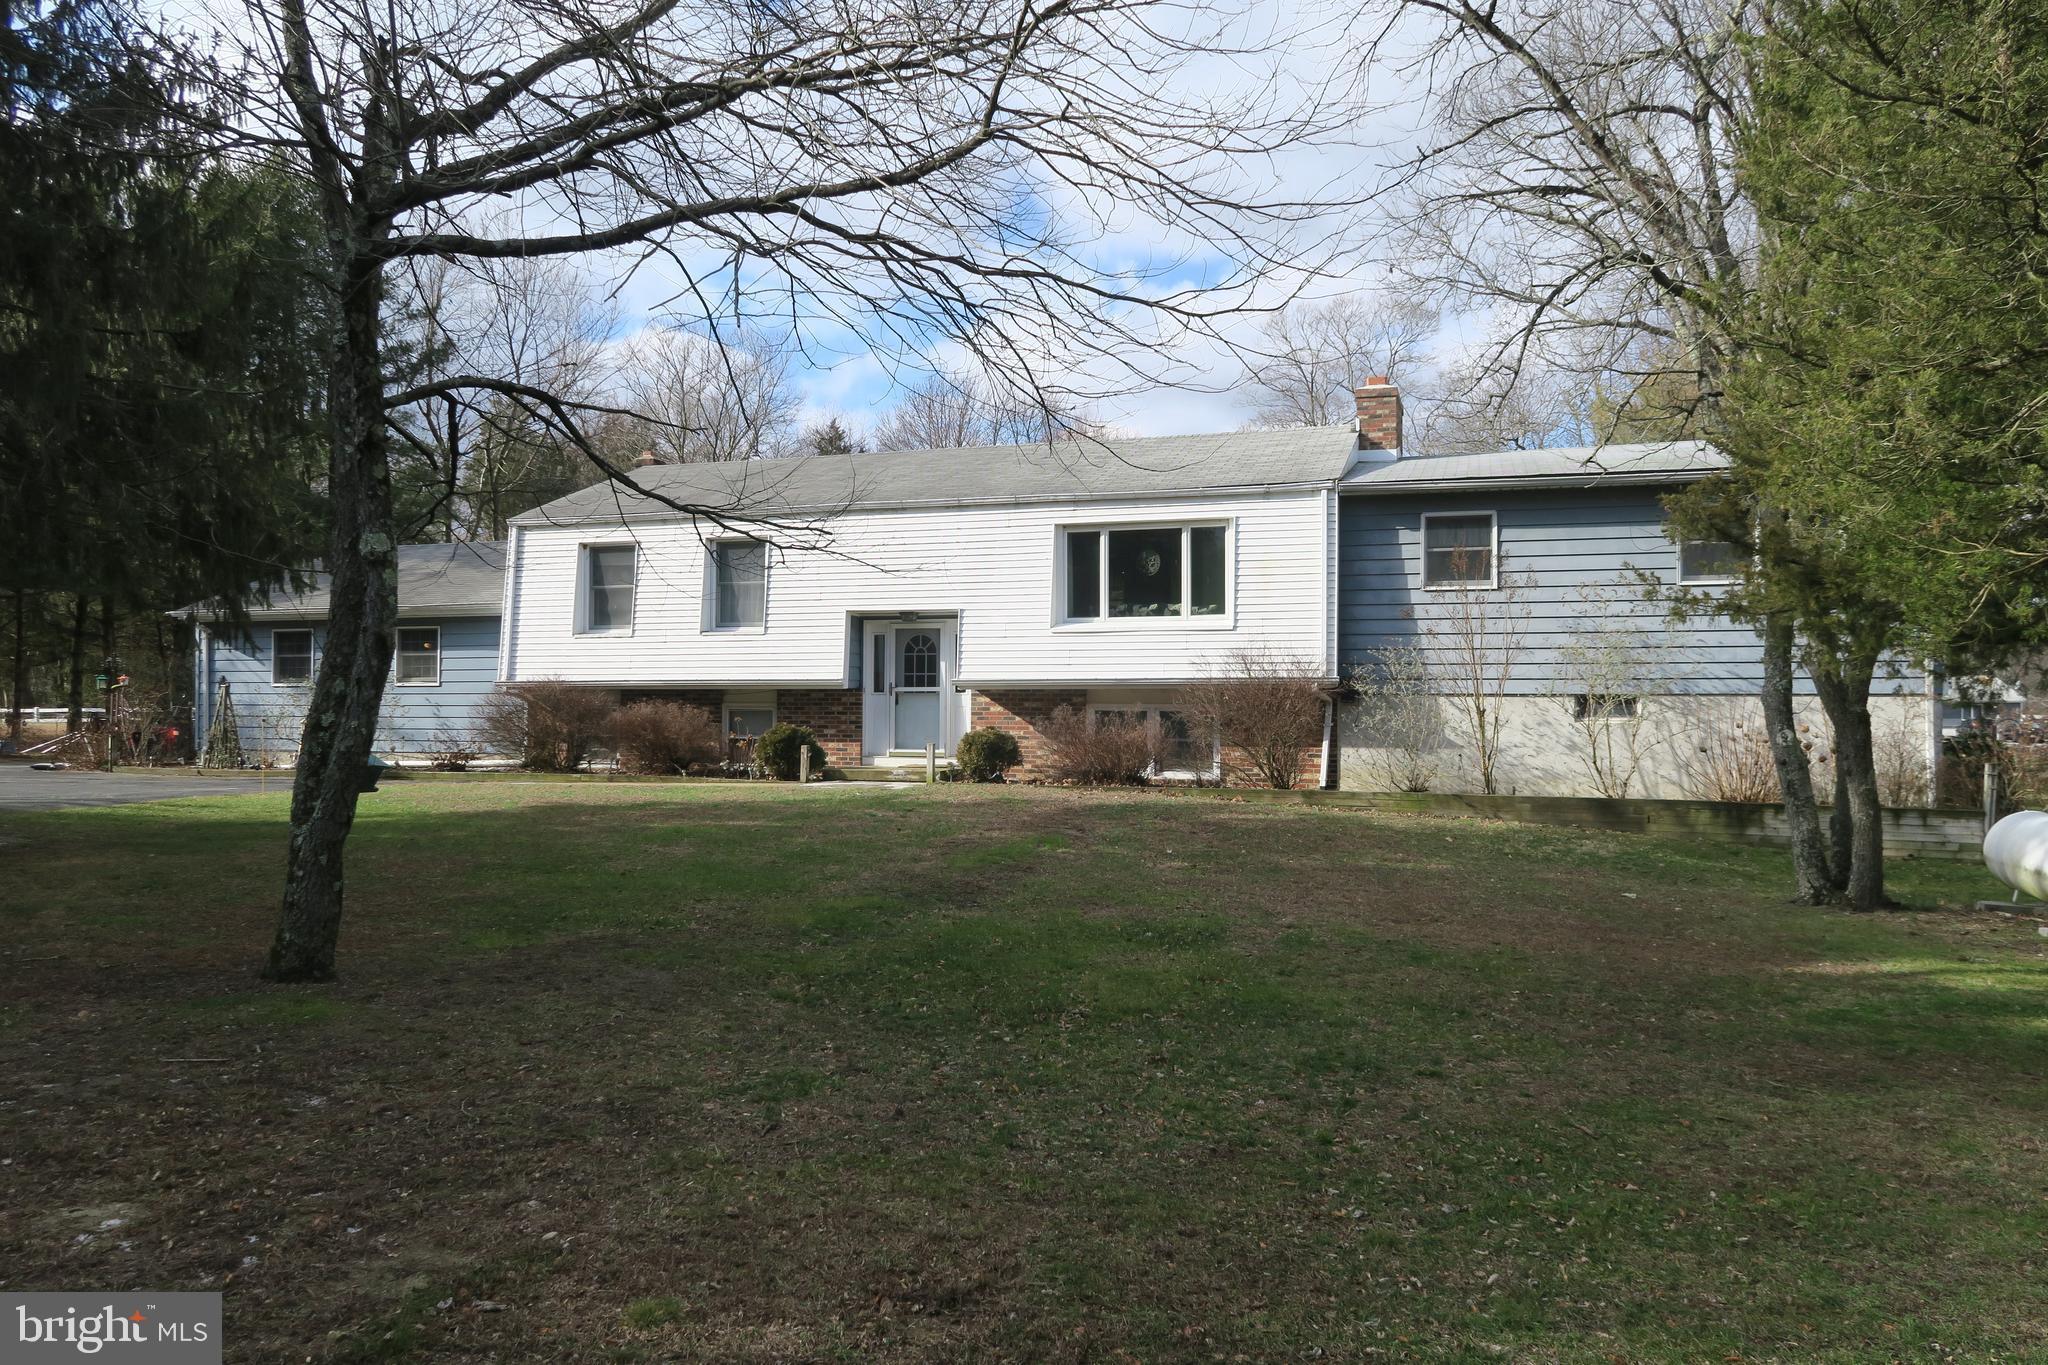 864 MONMOUTH ROAD, CREAM RIDGE, NJ 08514